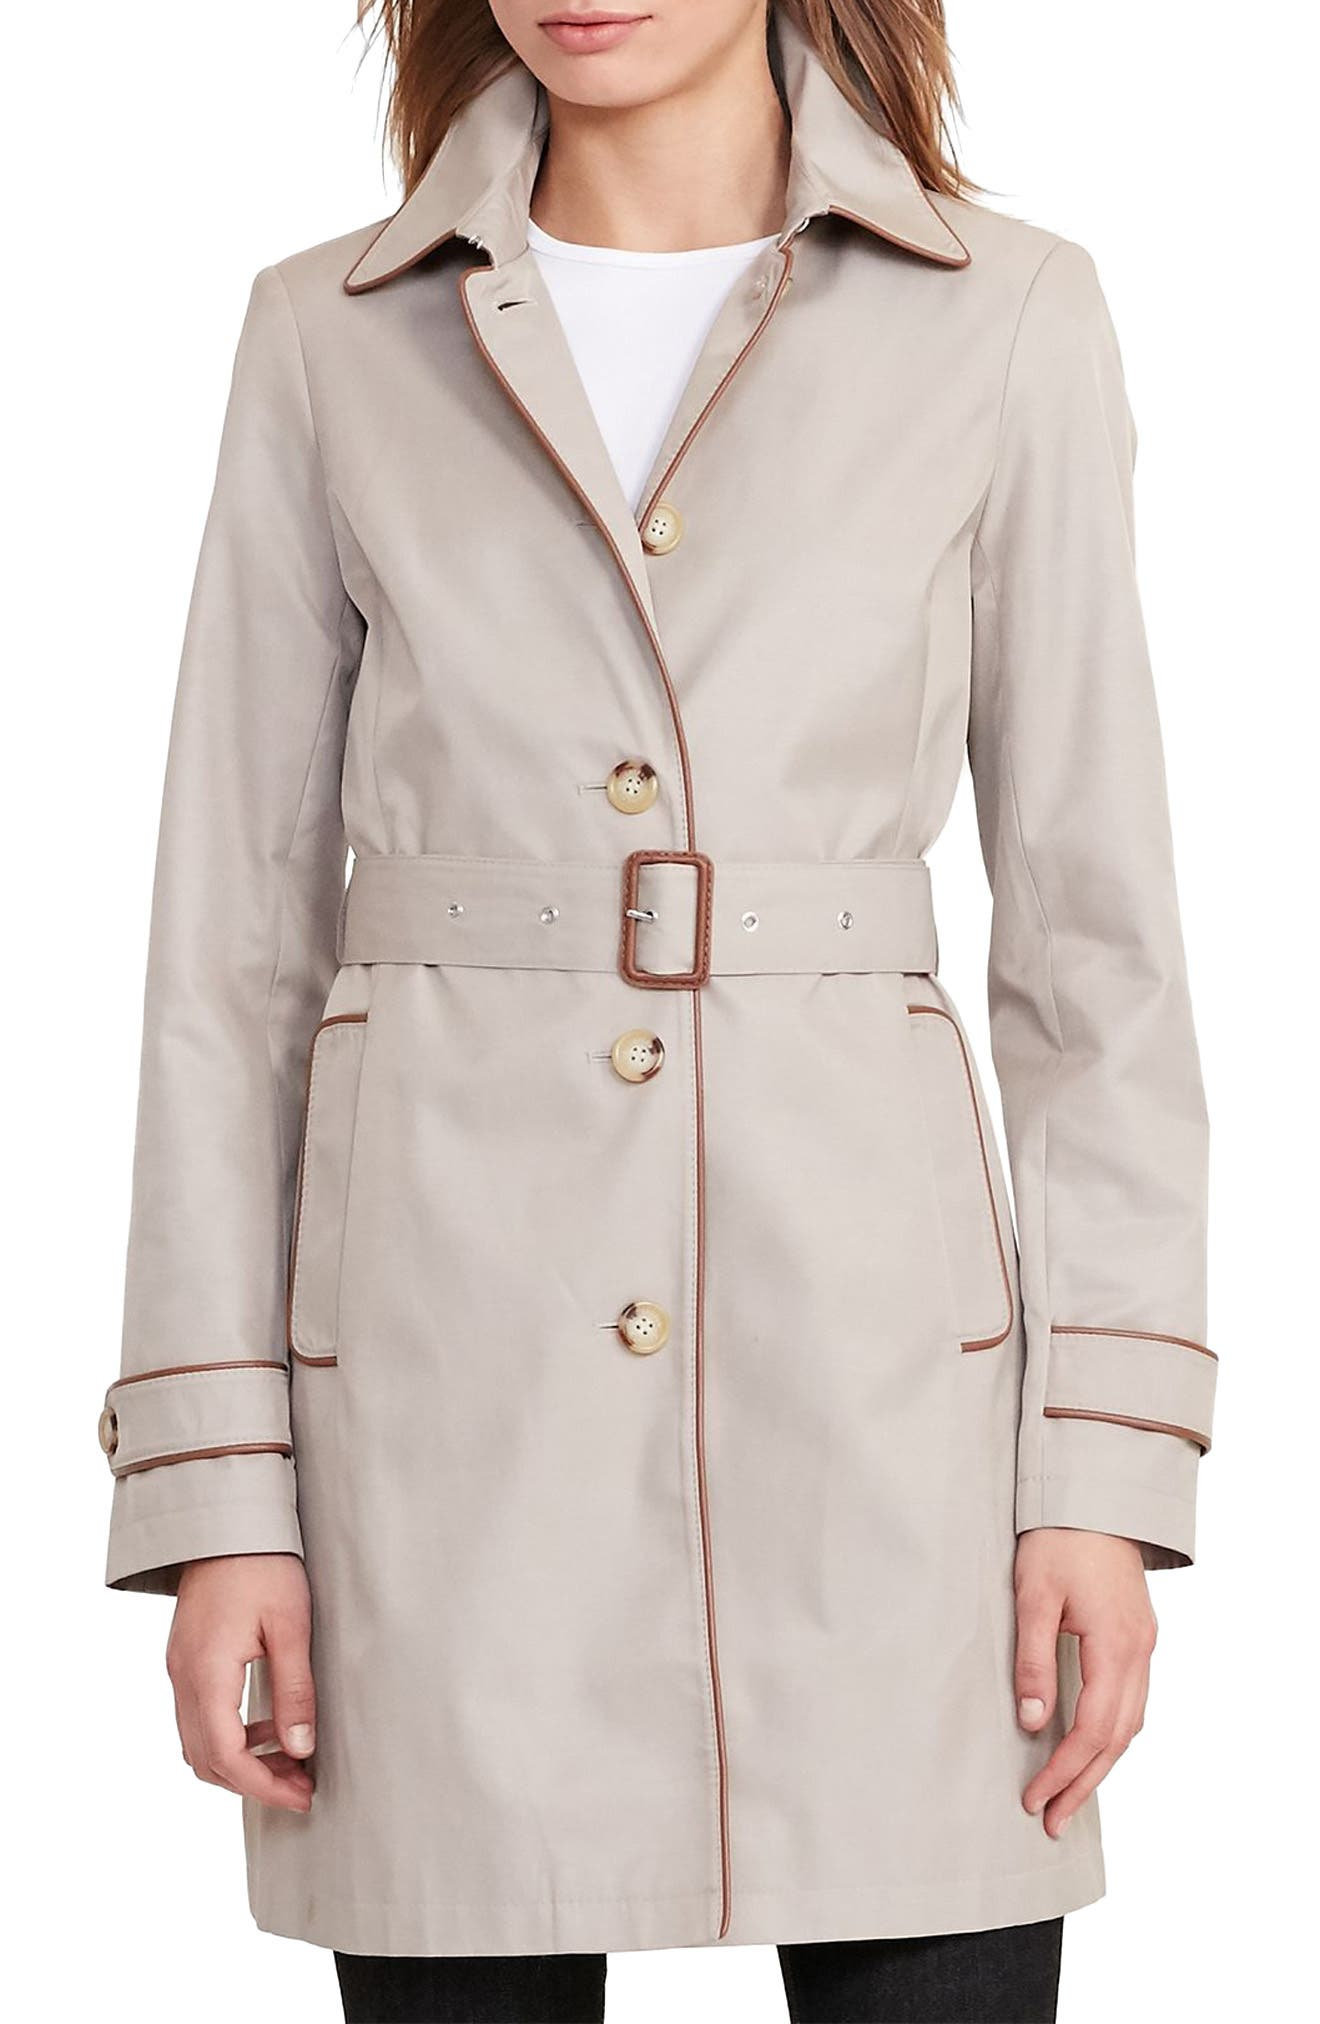 Main Image - Lauren Ralph Lauren Faux Leather Trim Trench Coat